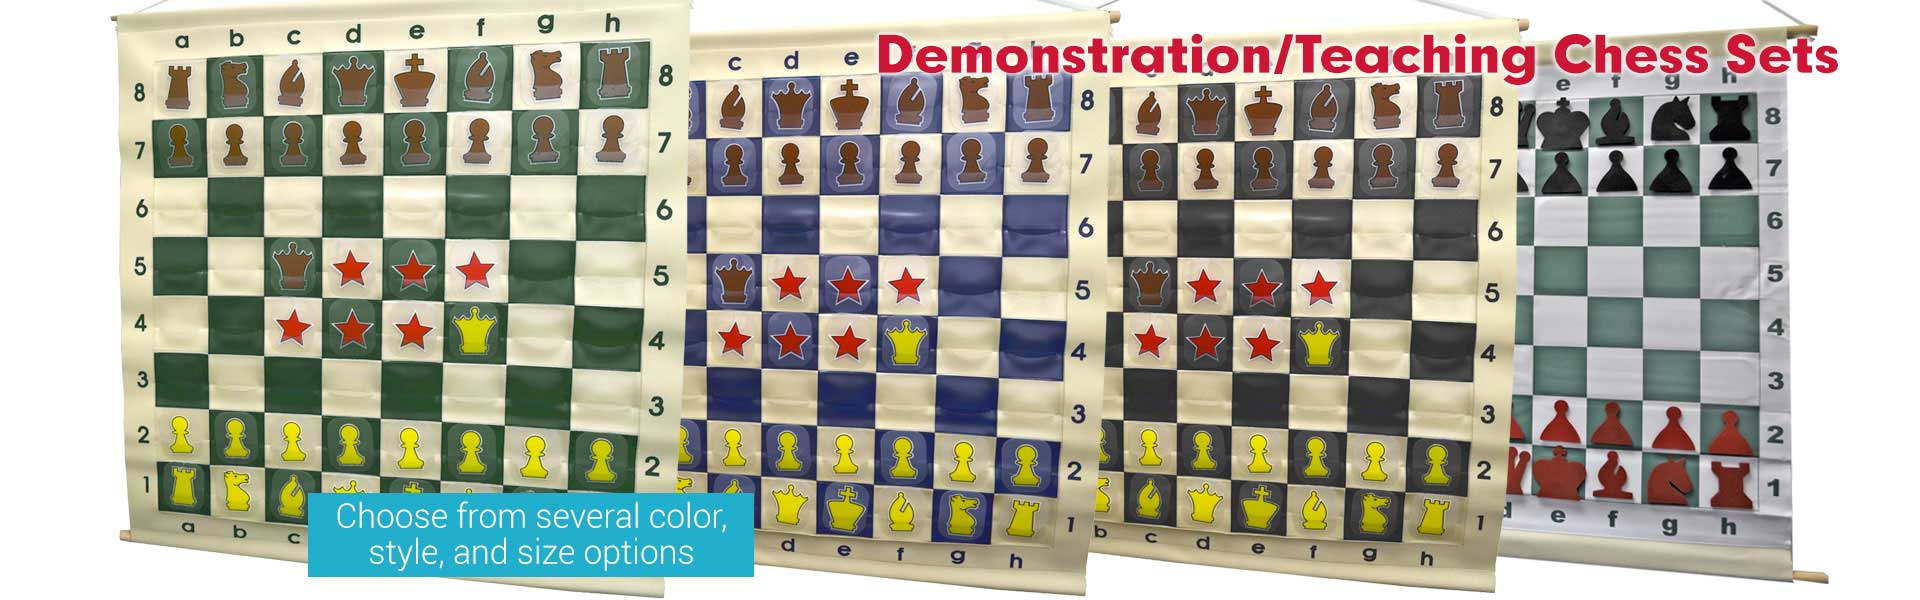 Demo Chess Sets